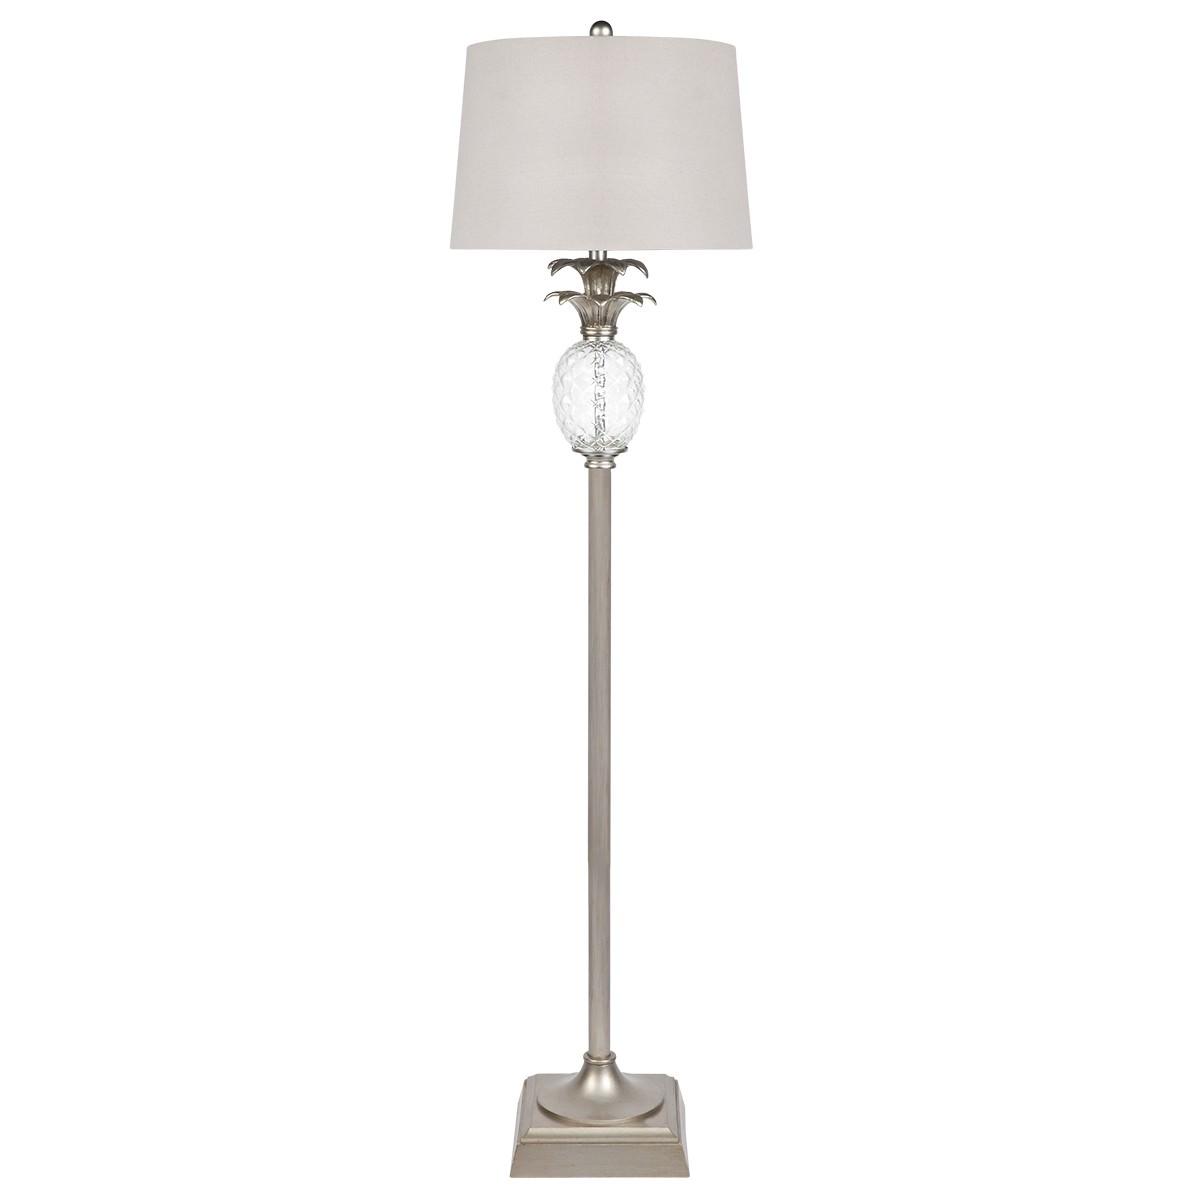 Langley Floor Lamp, Antique Silver